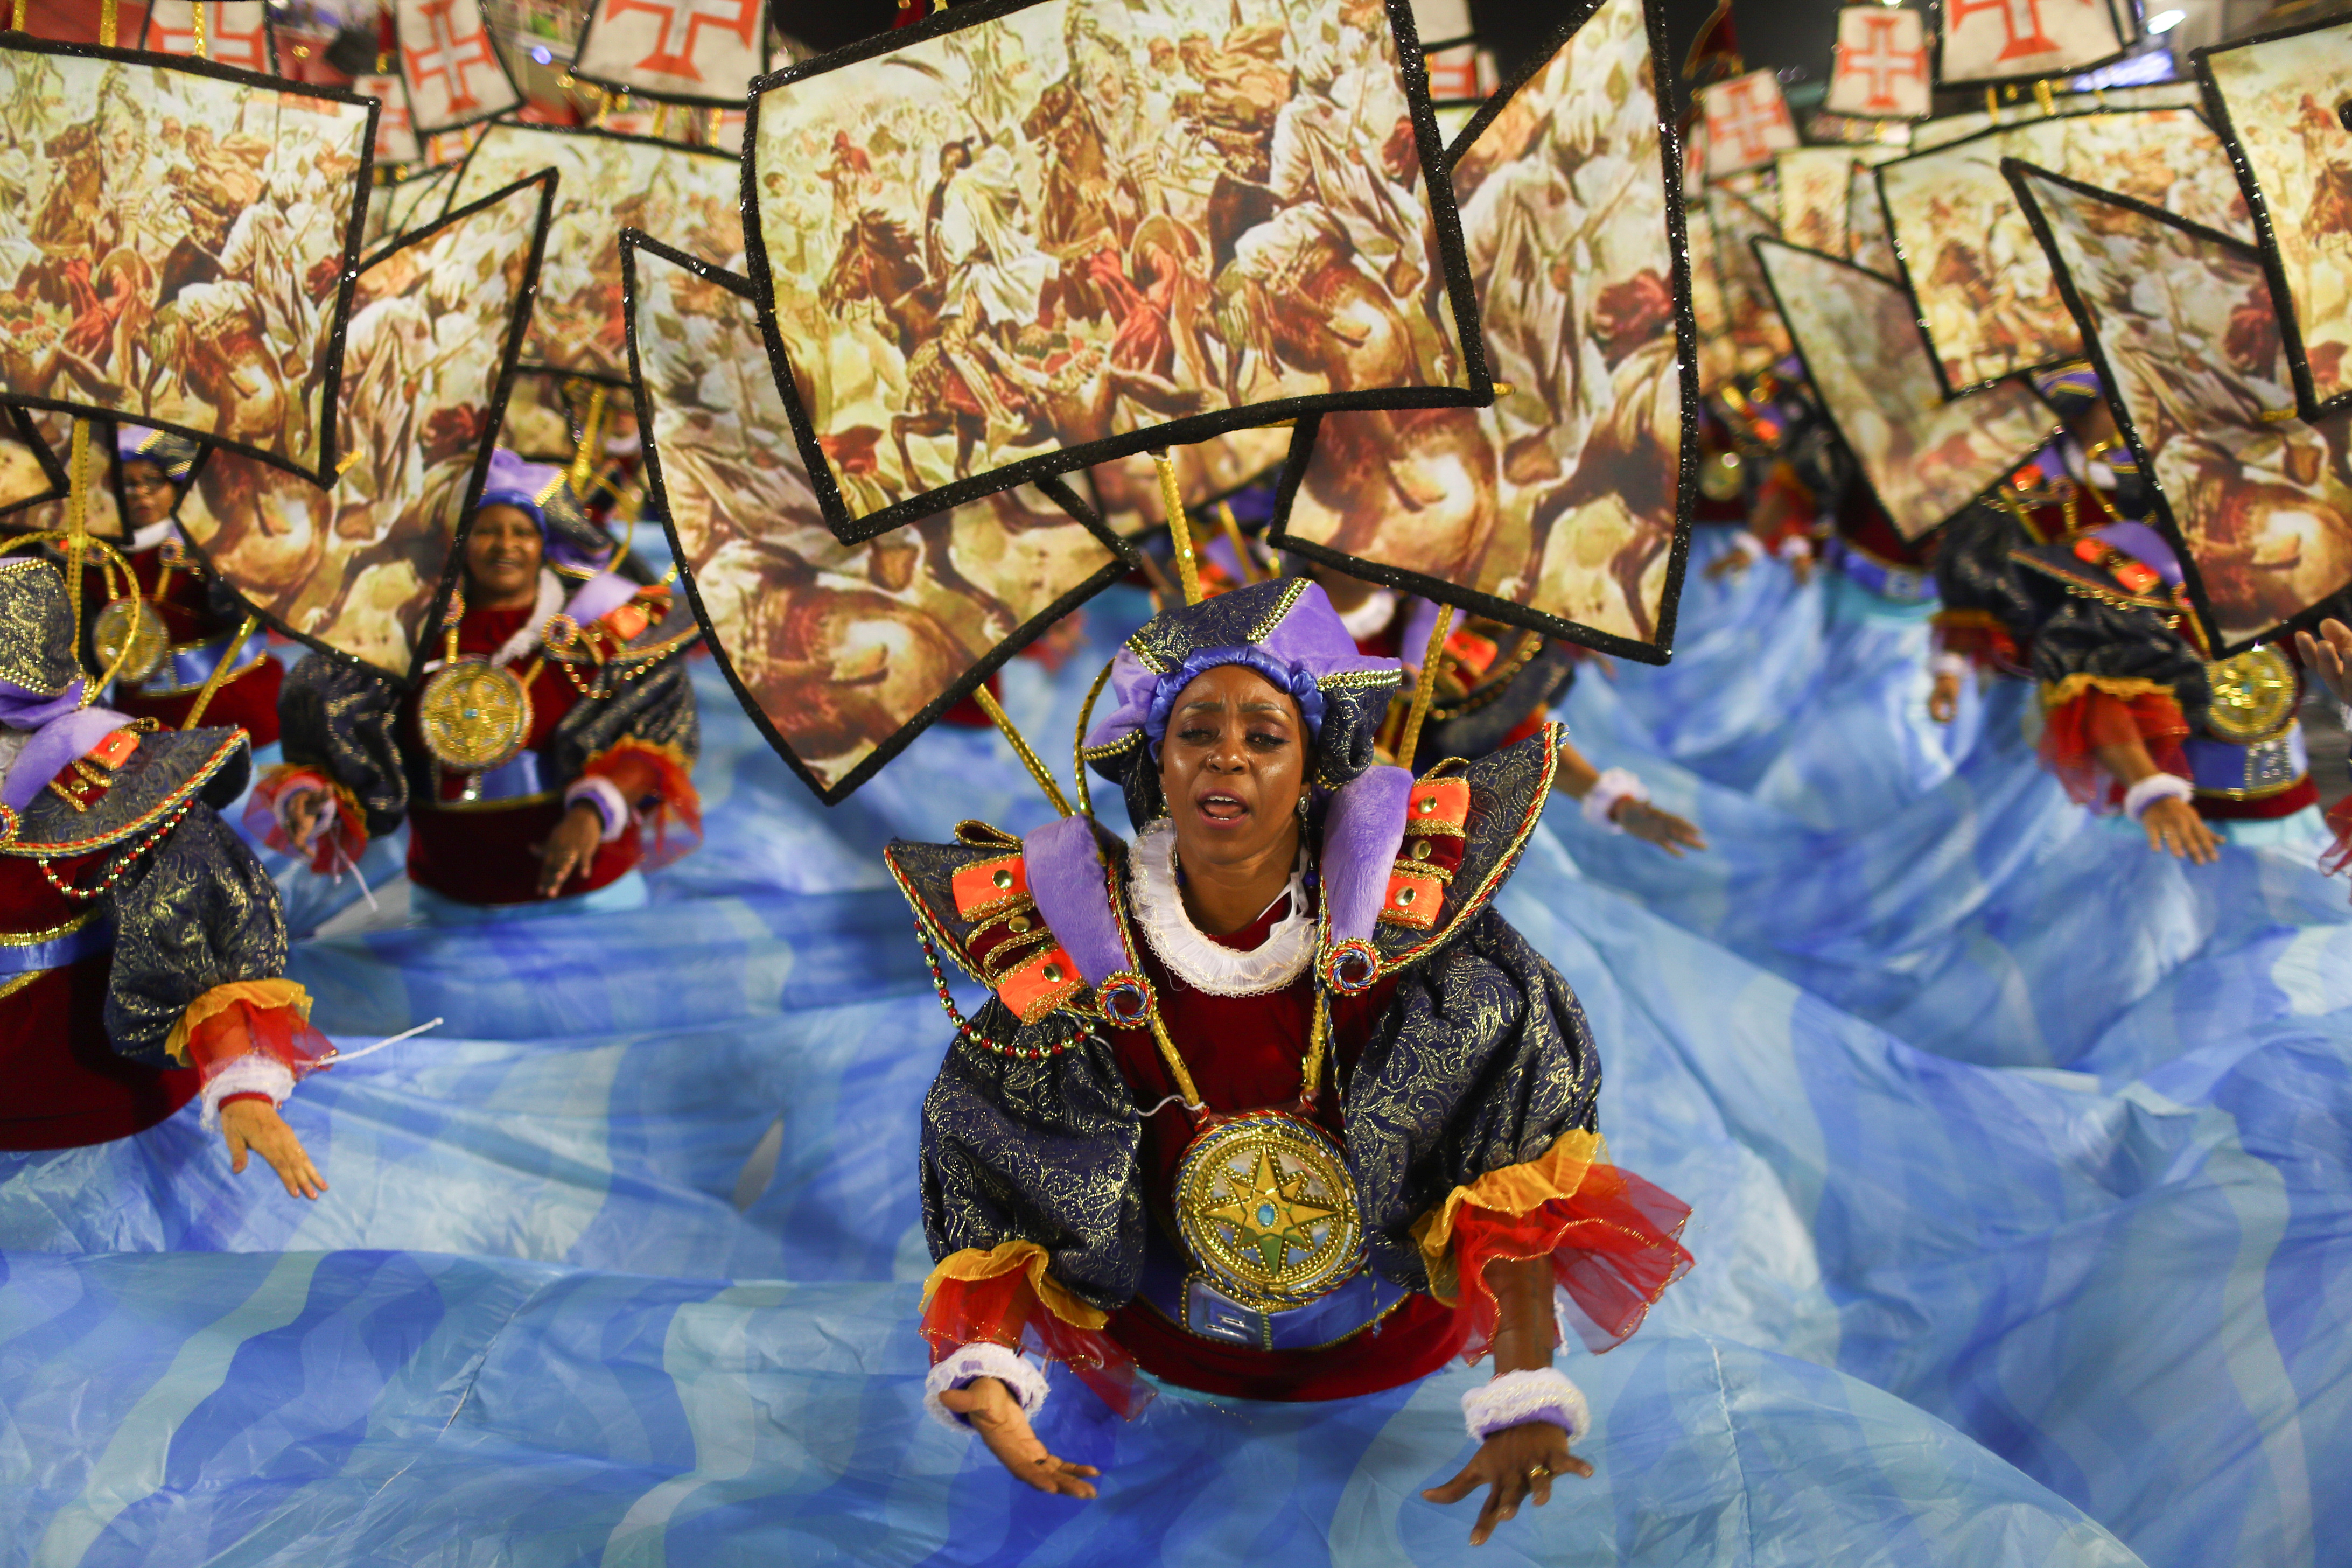 Una bailarina de Paraiso do Tuiuti ( REUTERS/Pilar Olivares)